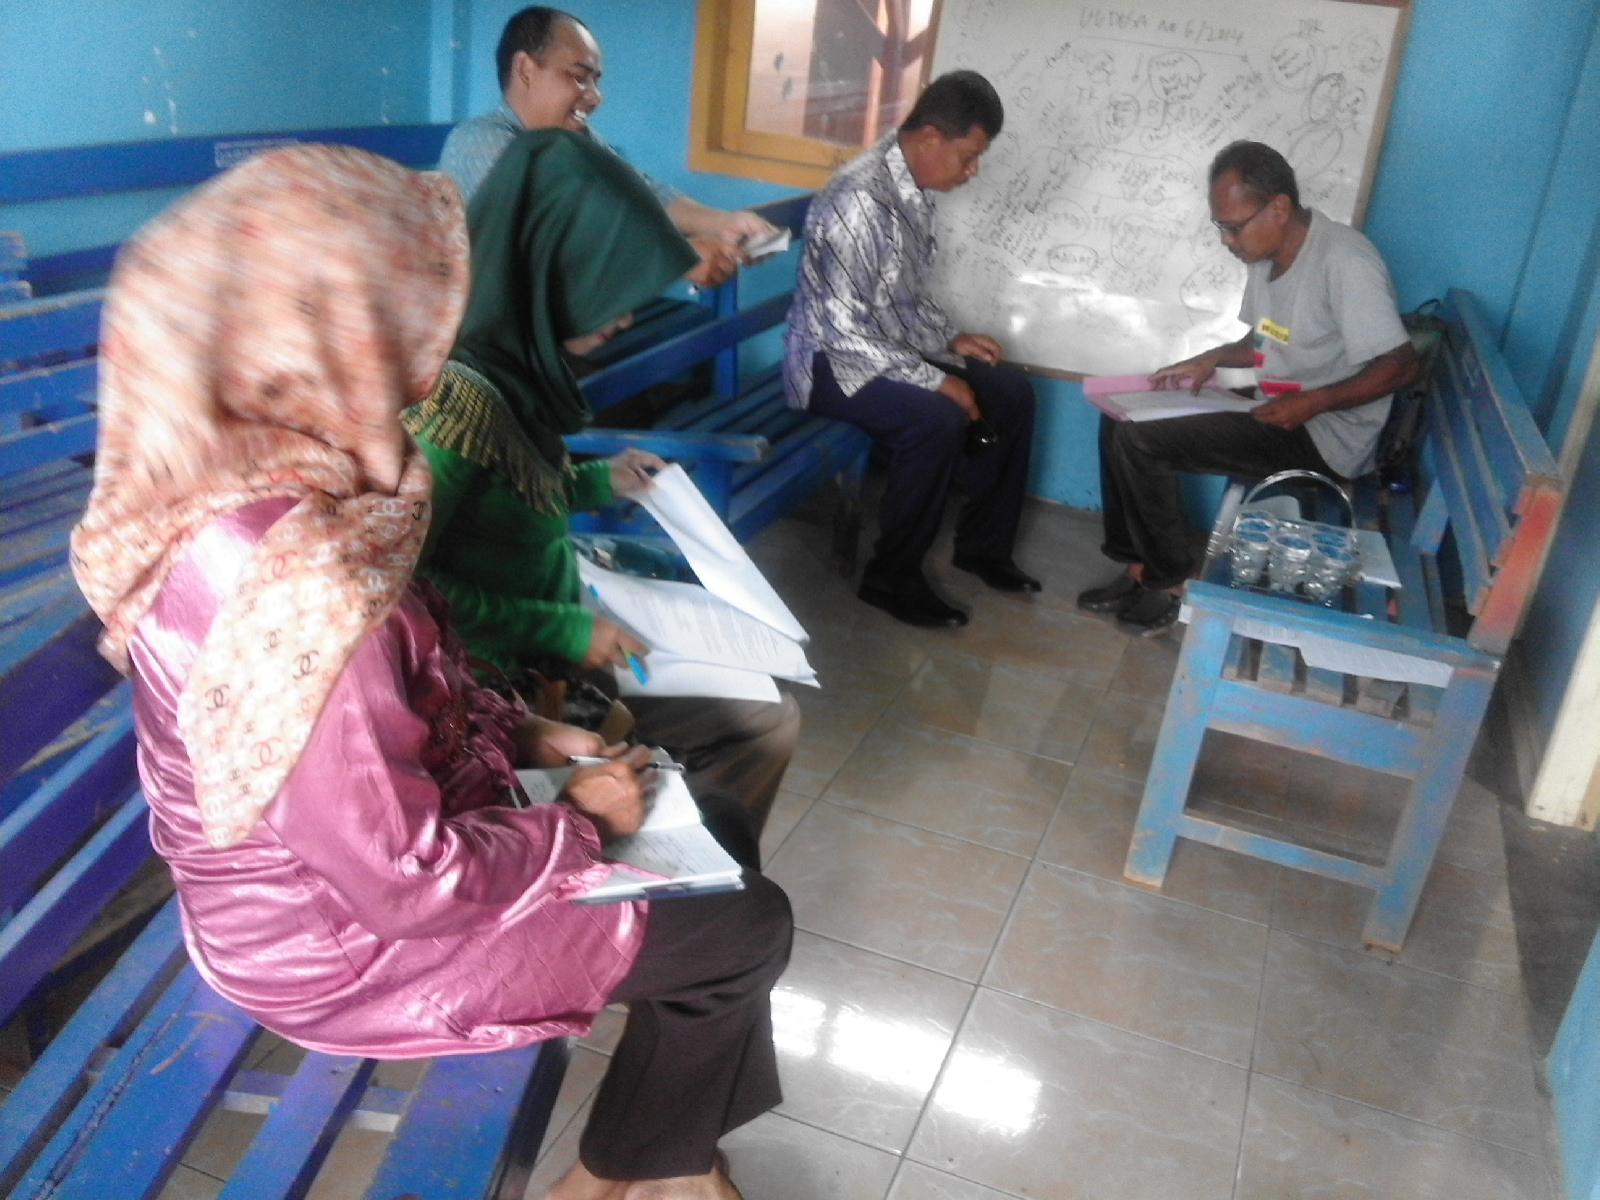 Sekretaris Desa, Koswara Nugraha memperlihatkan contoh ADART BUMDes kepada Pemateri, Pak Maman